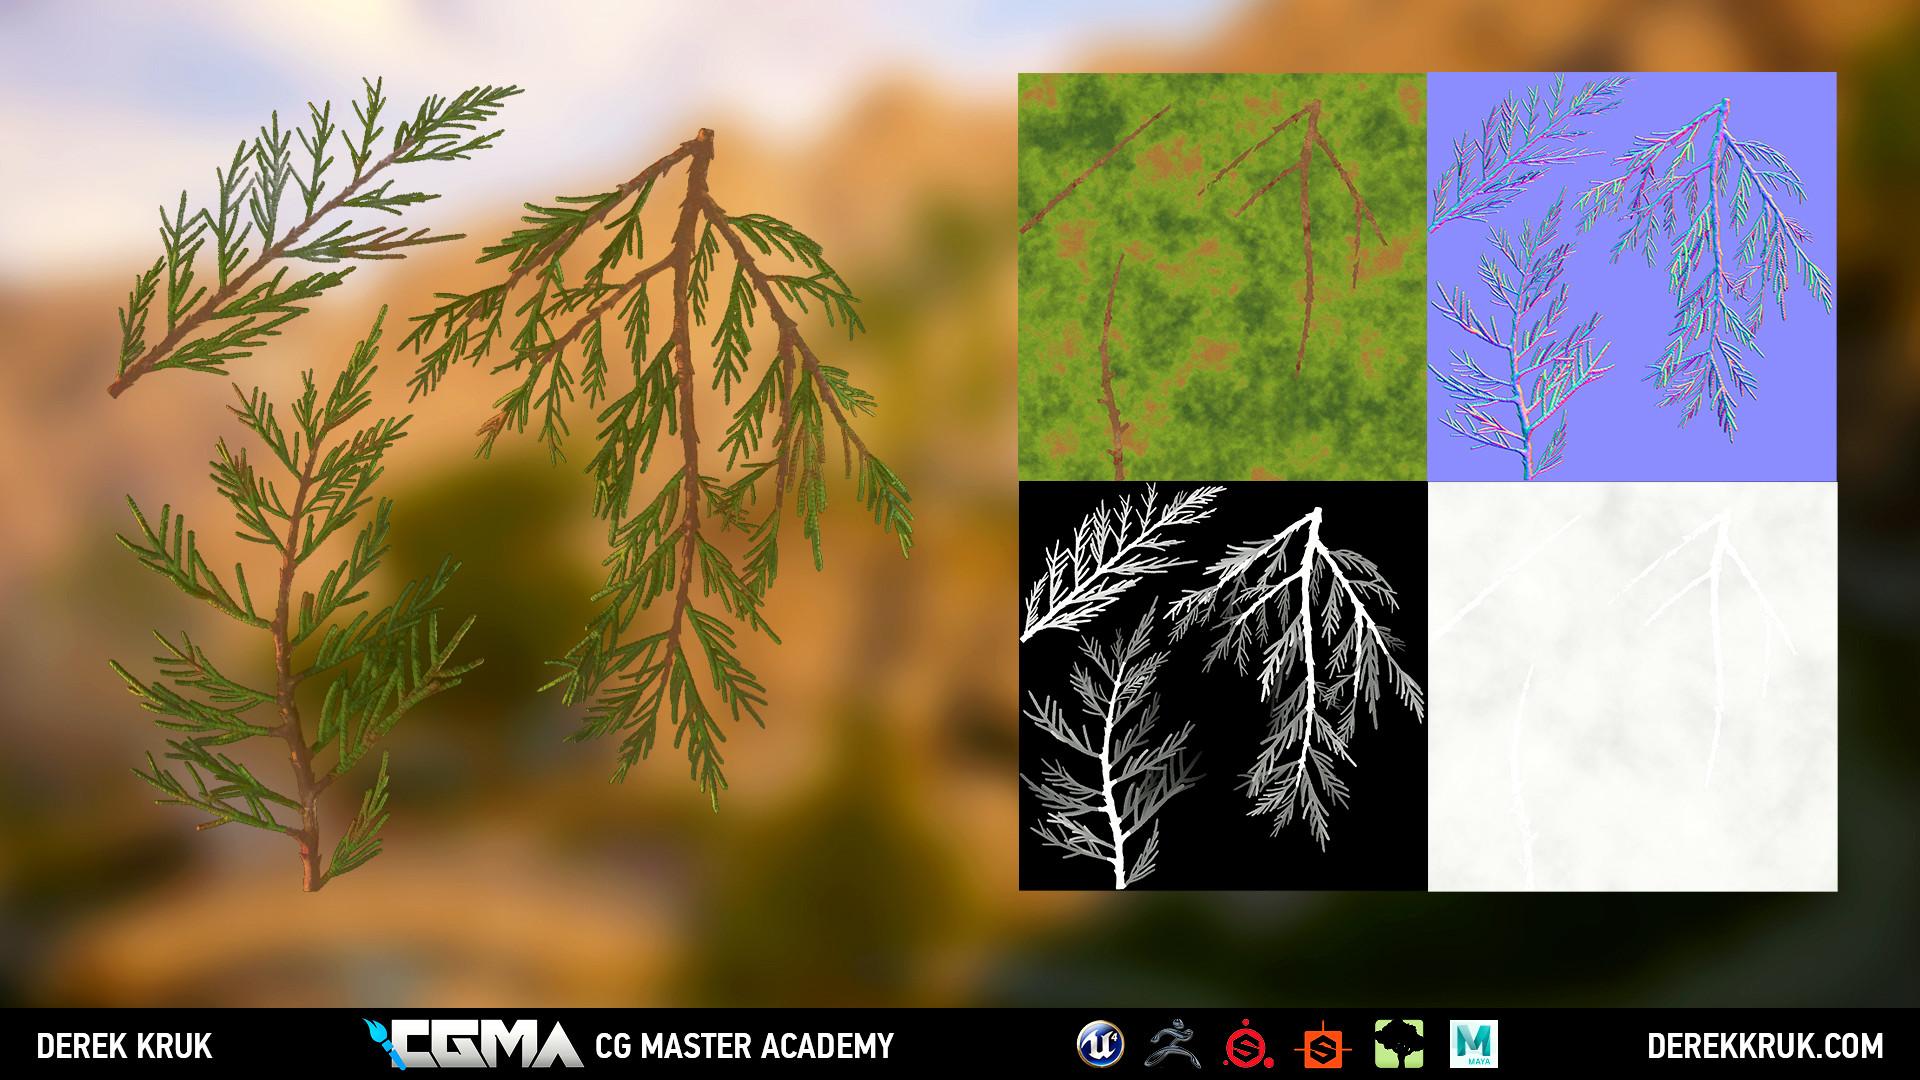 Derek kruk cypress